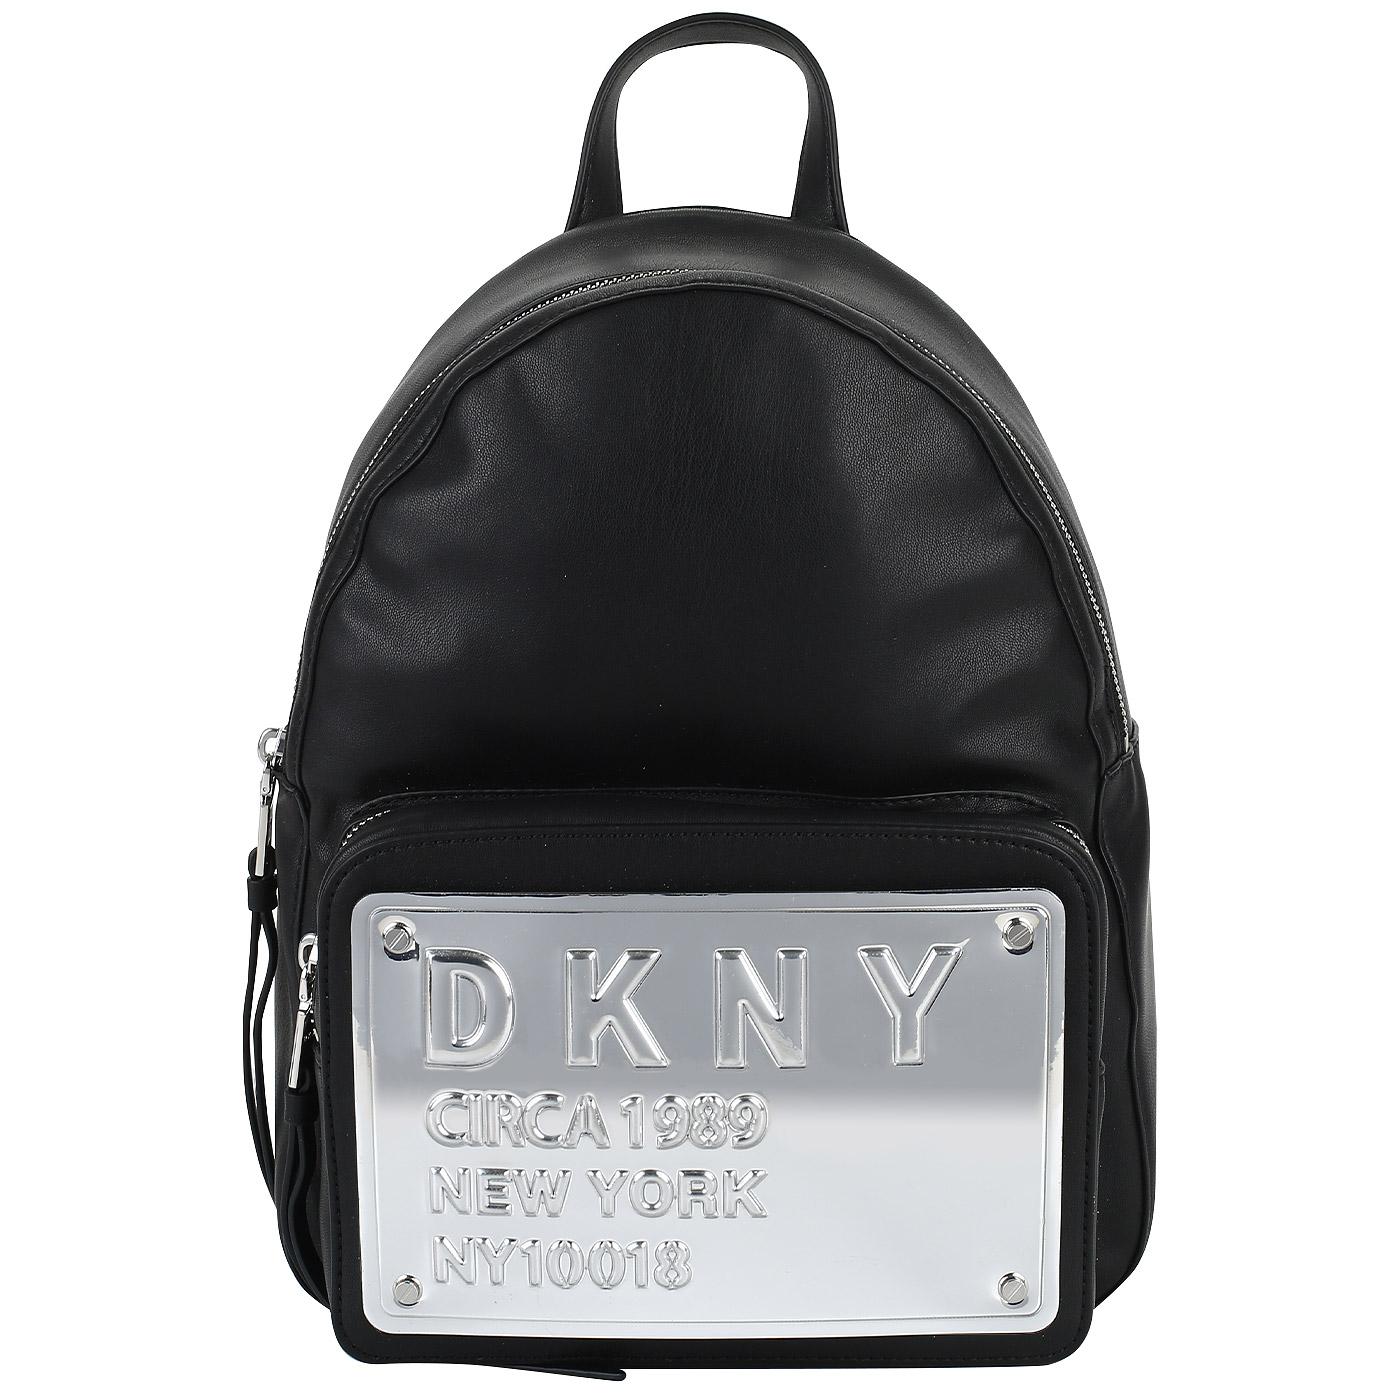 7ccc41926d39 Рюкзак с декором DKNY 10018 R83KY632-BSV - 2000557943292 черный ...